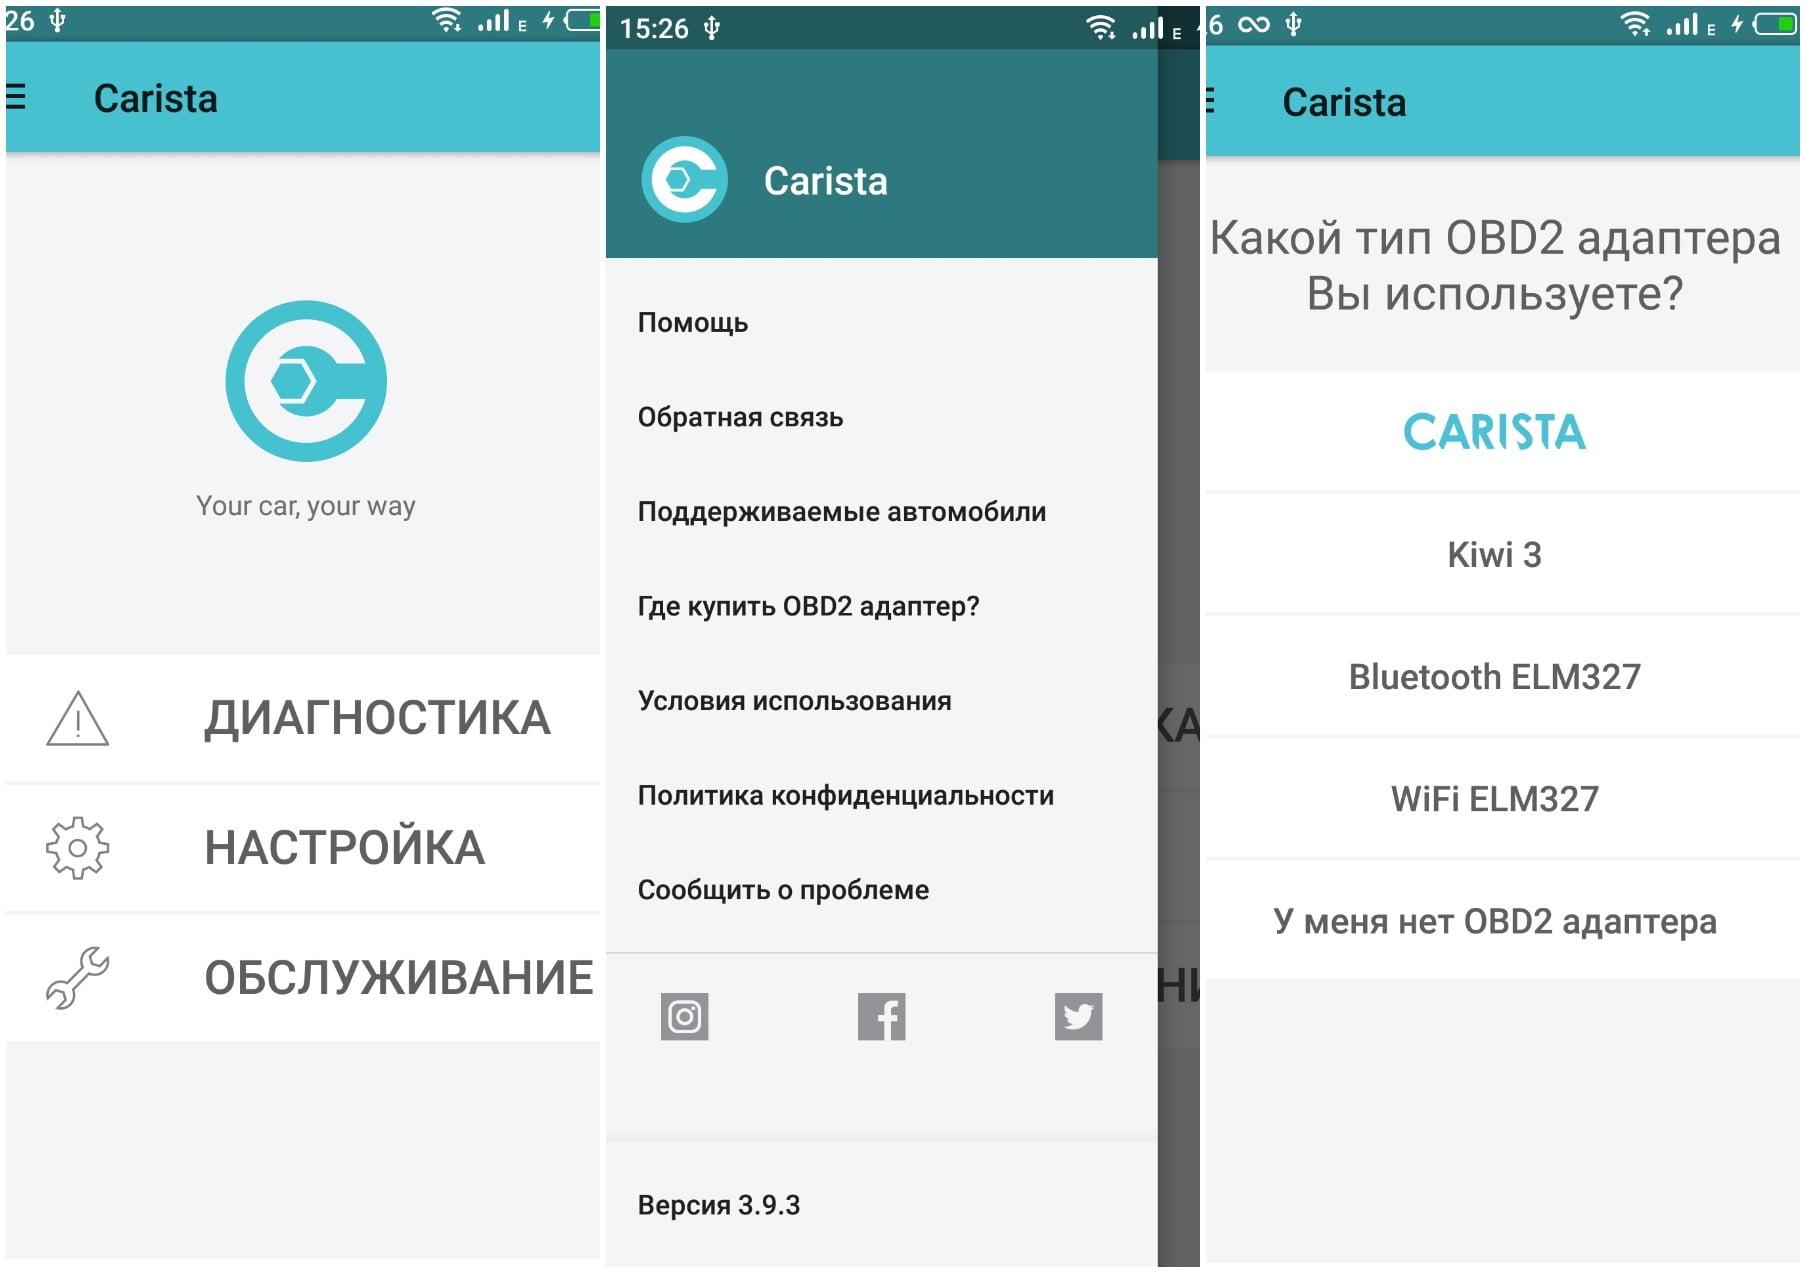 На фото изображено приложение Carista obd2